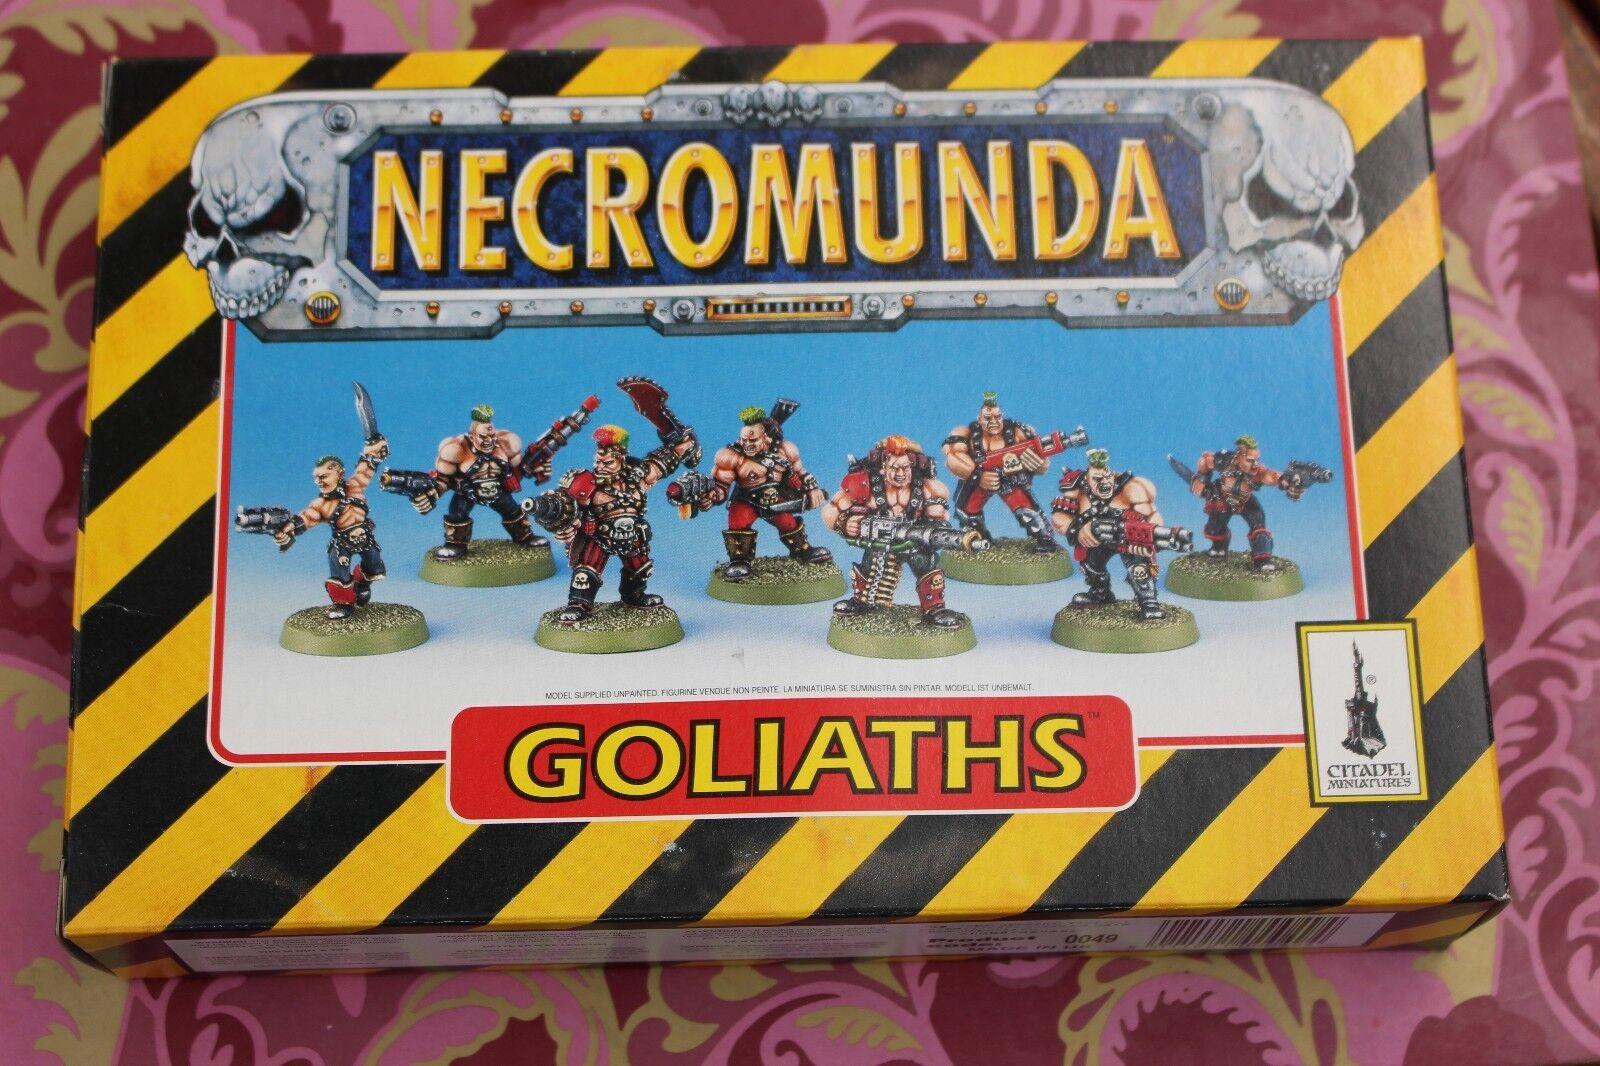 Games Workshop Warhammer 40k Necromunda Goliaths Gang WH40K Metal Extras Boxed